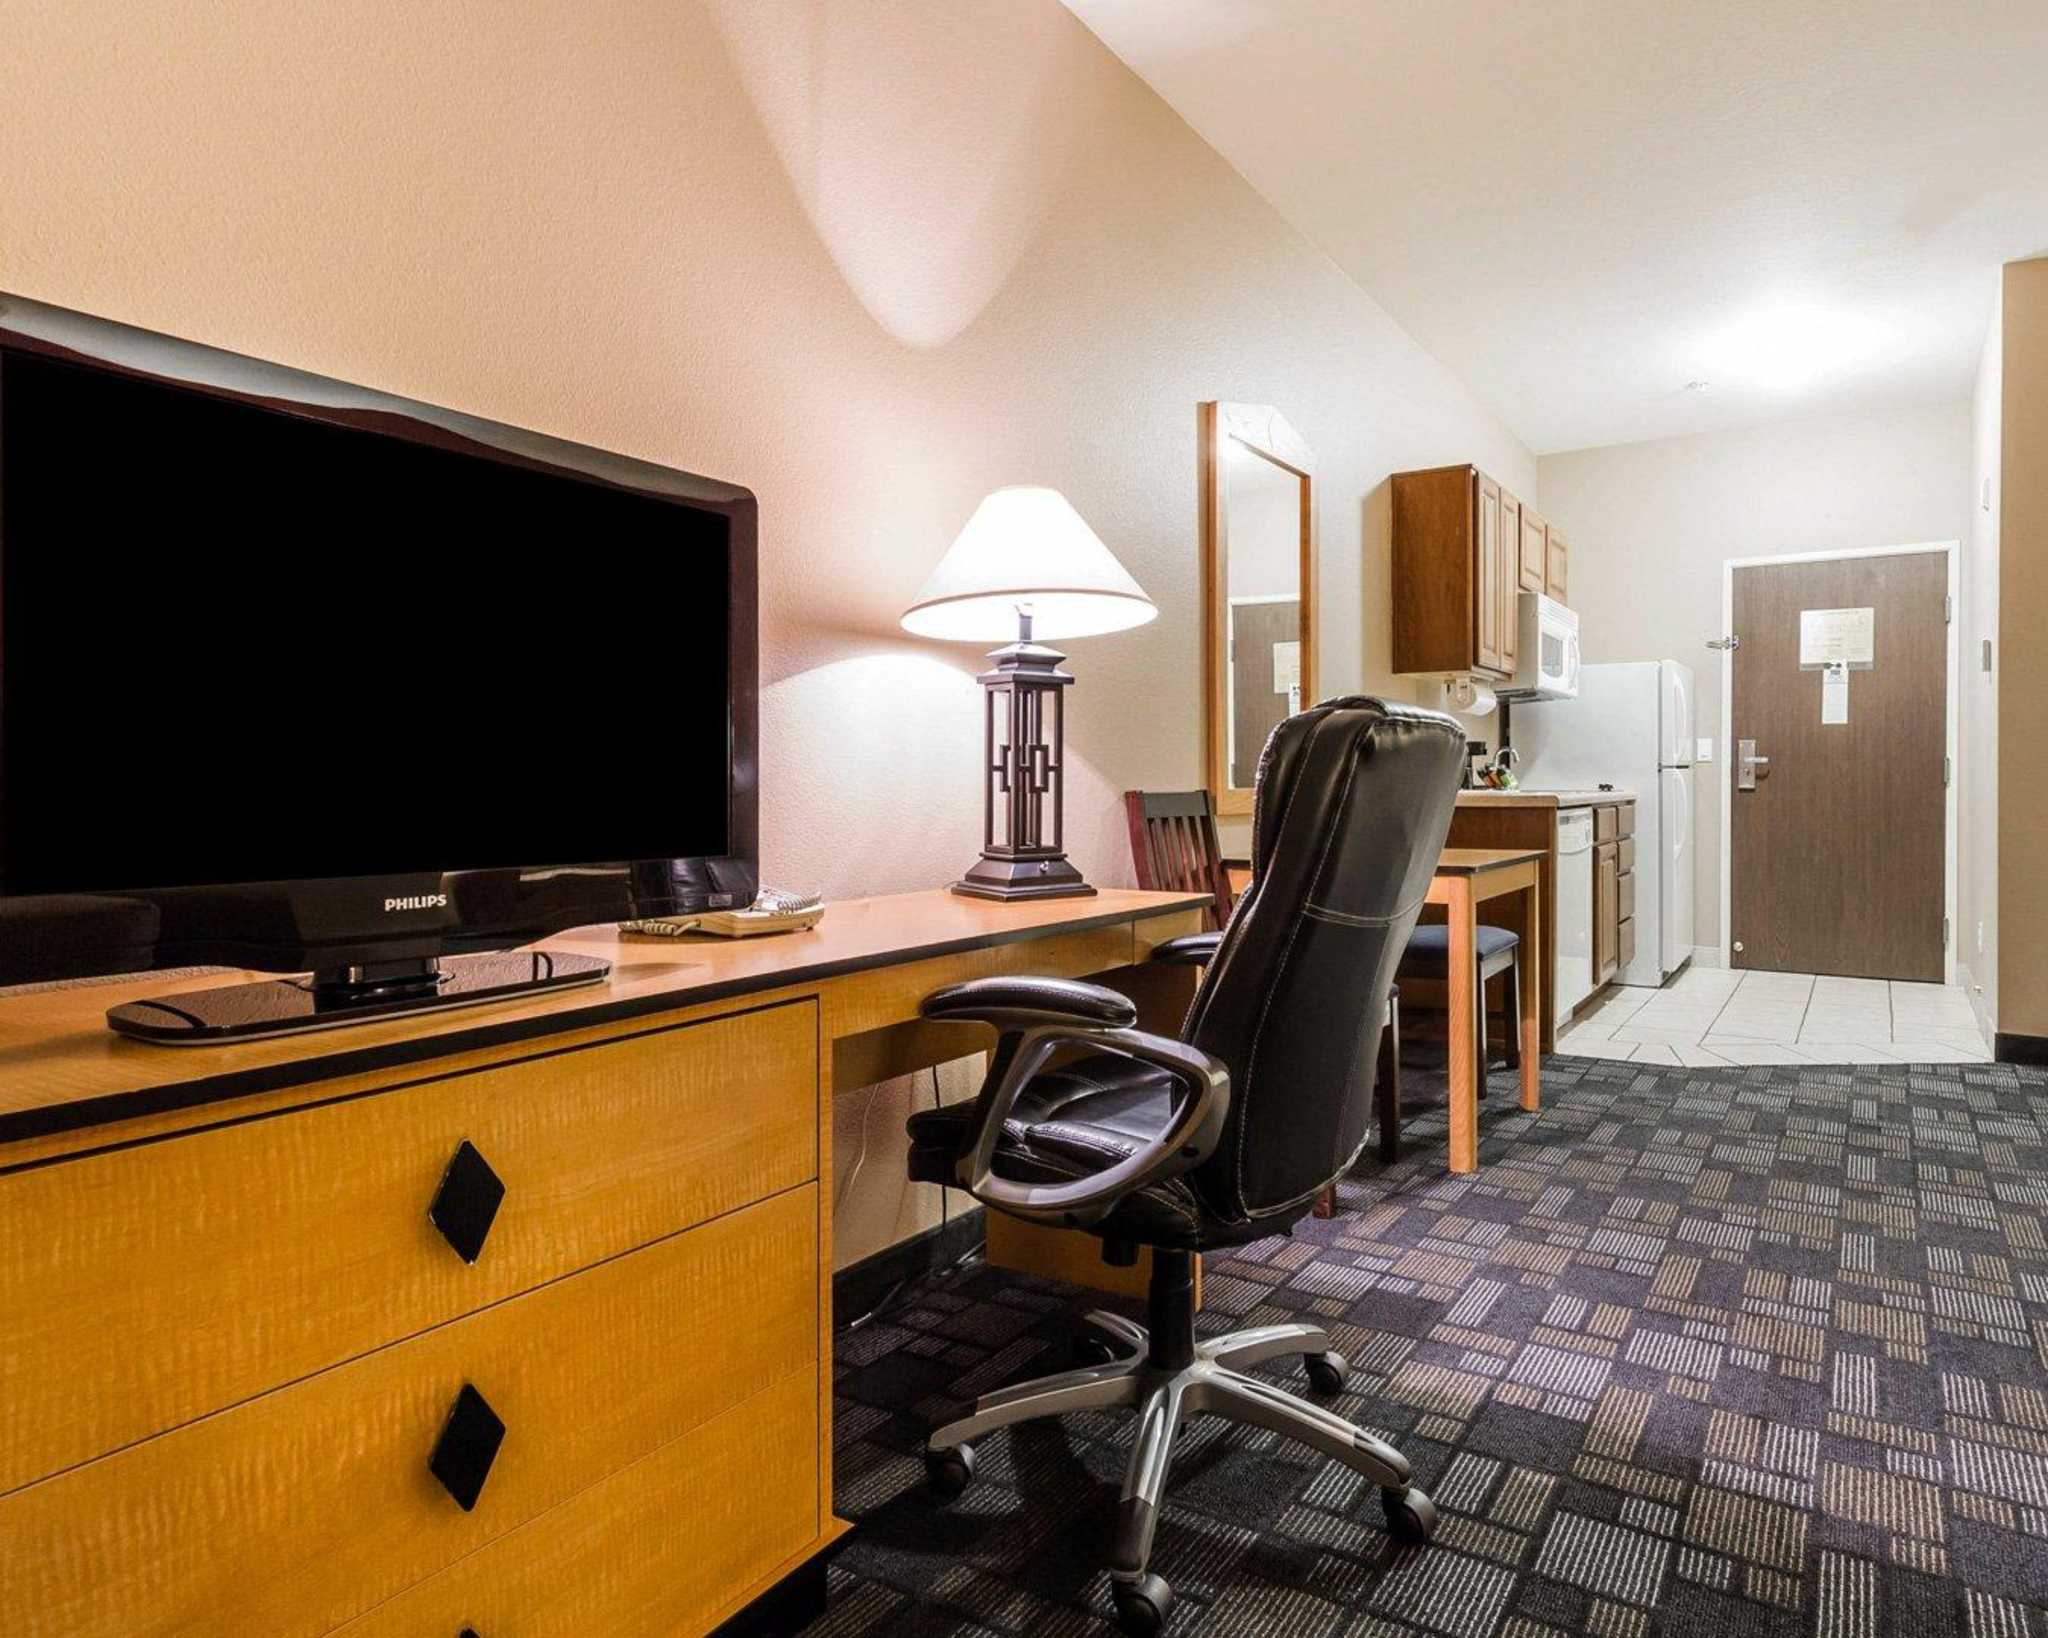 Mainstay Suites Casa Grande Arizona Az Localdatabase Com